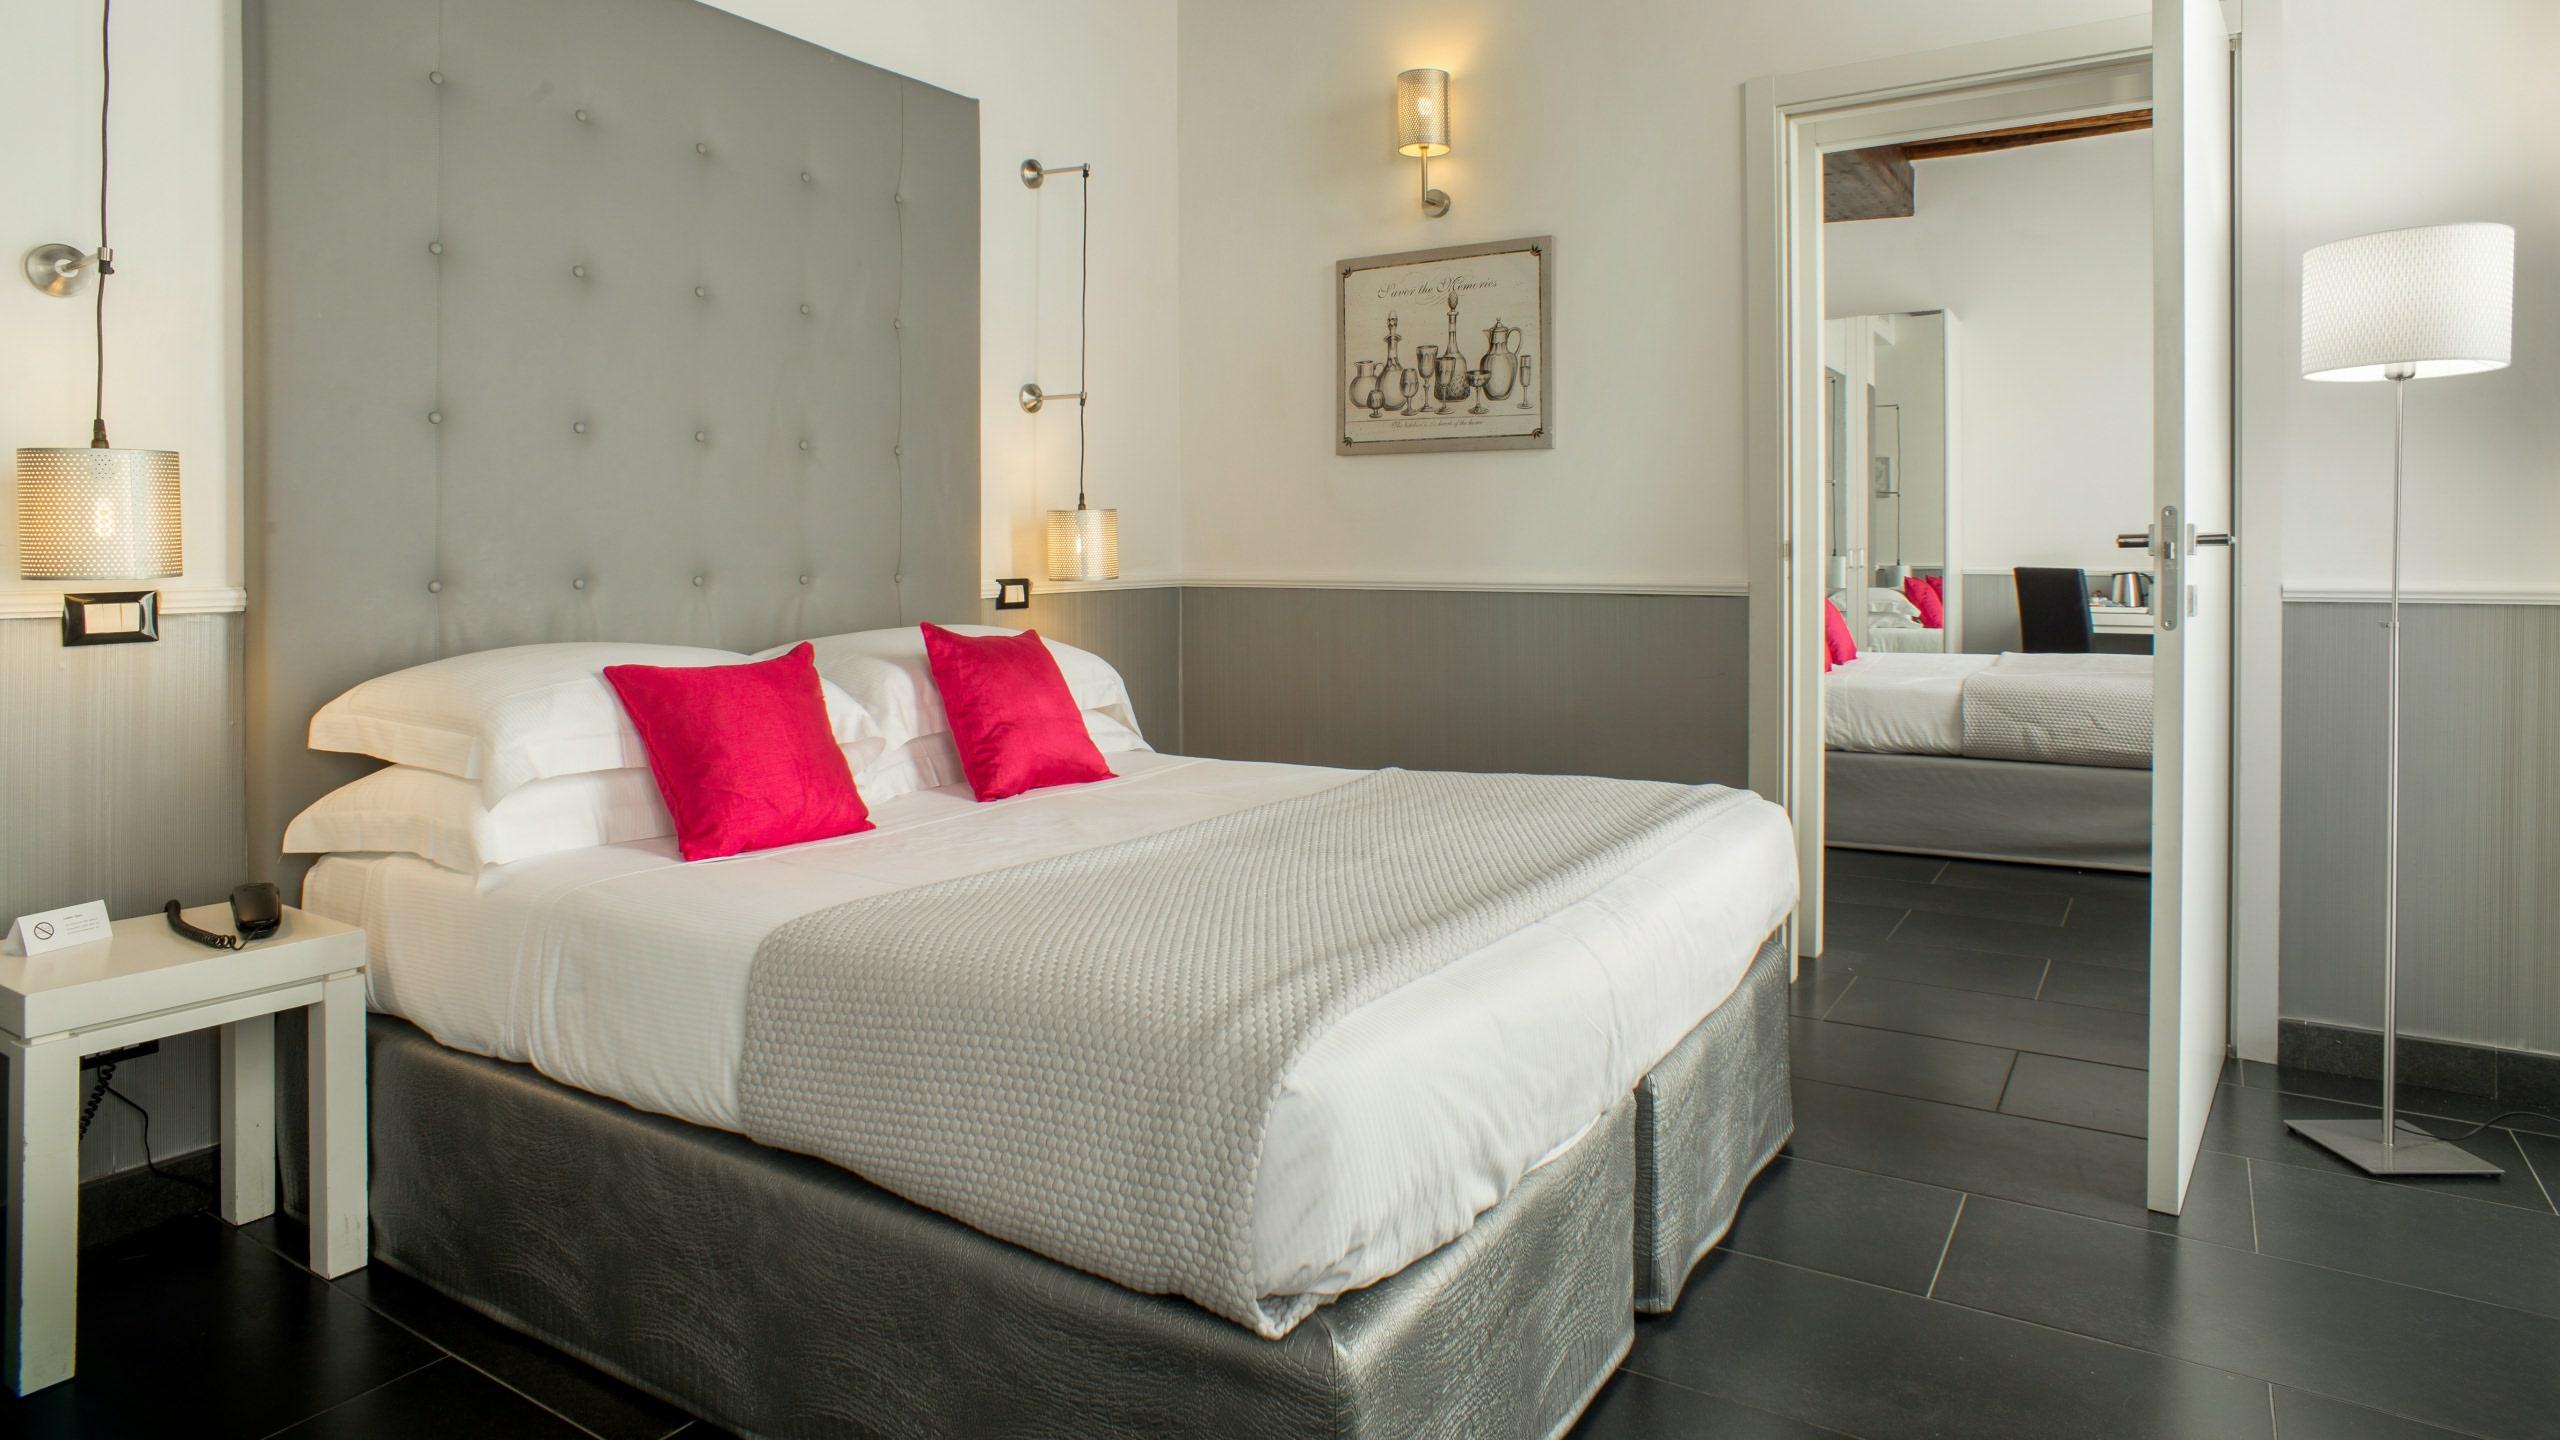 stay-inn-rome-roma-rooms-8390